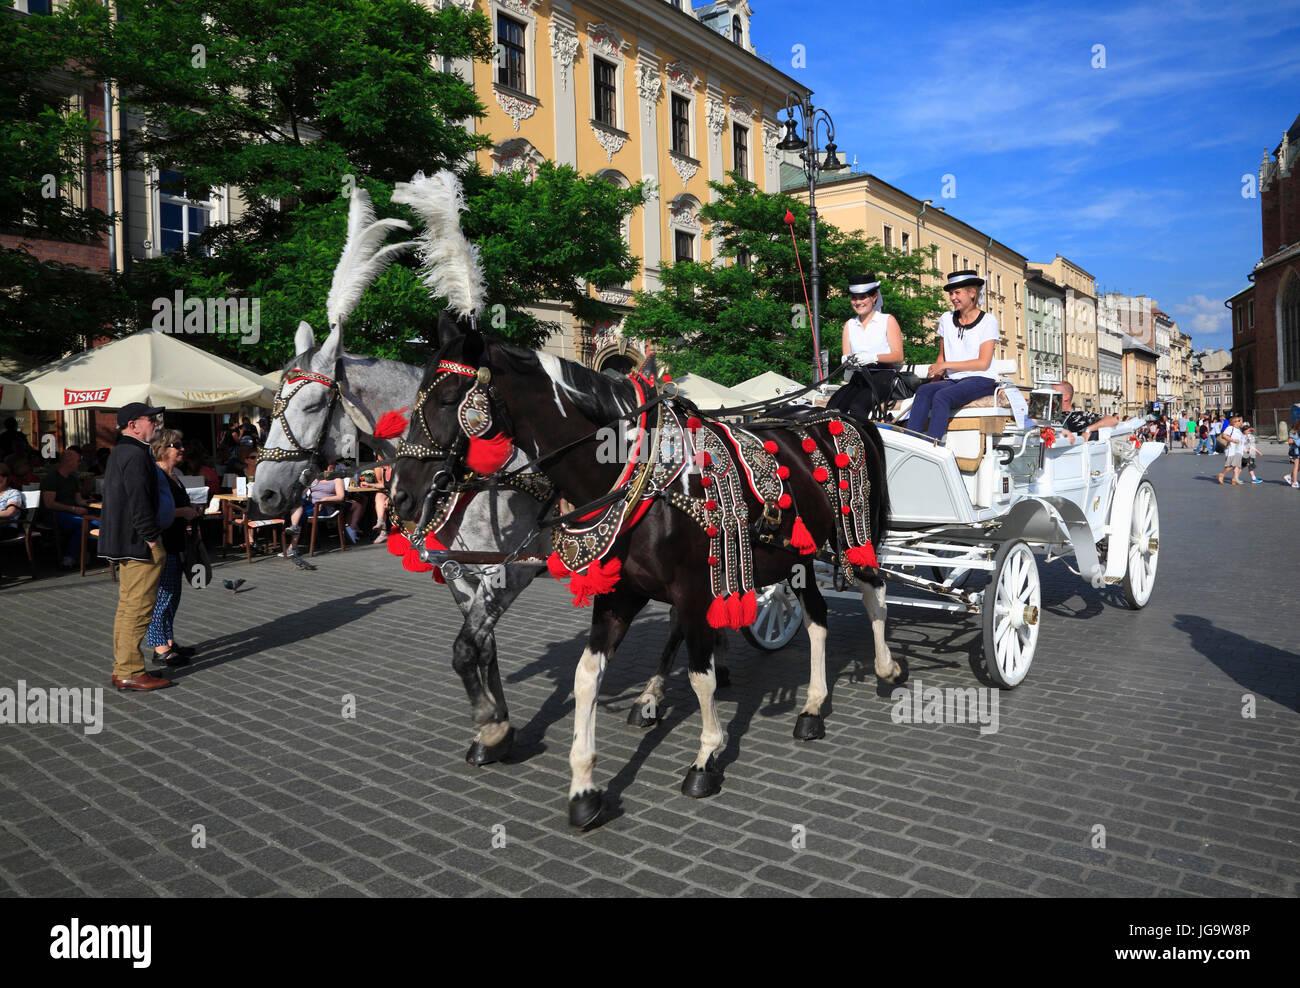 Europa, Polen, Krakau, Pferdekutsche am Rynek - Stock Image